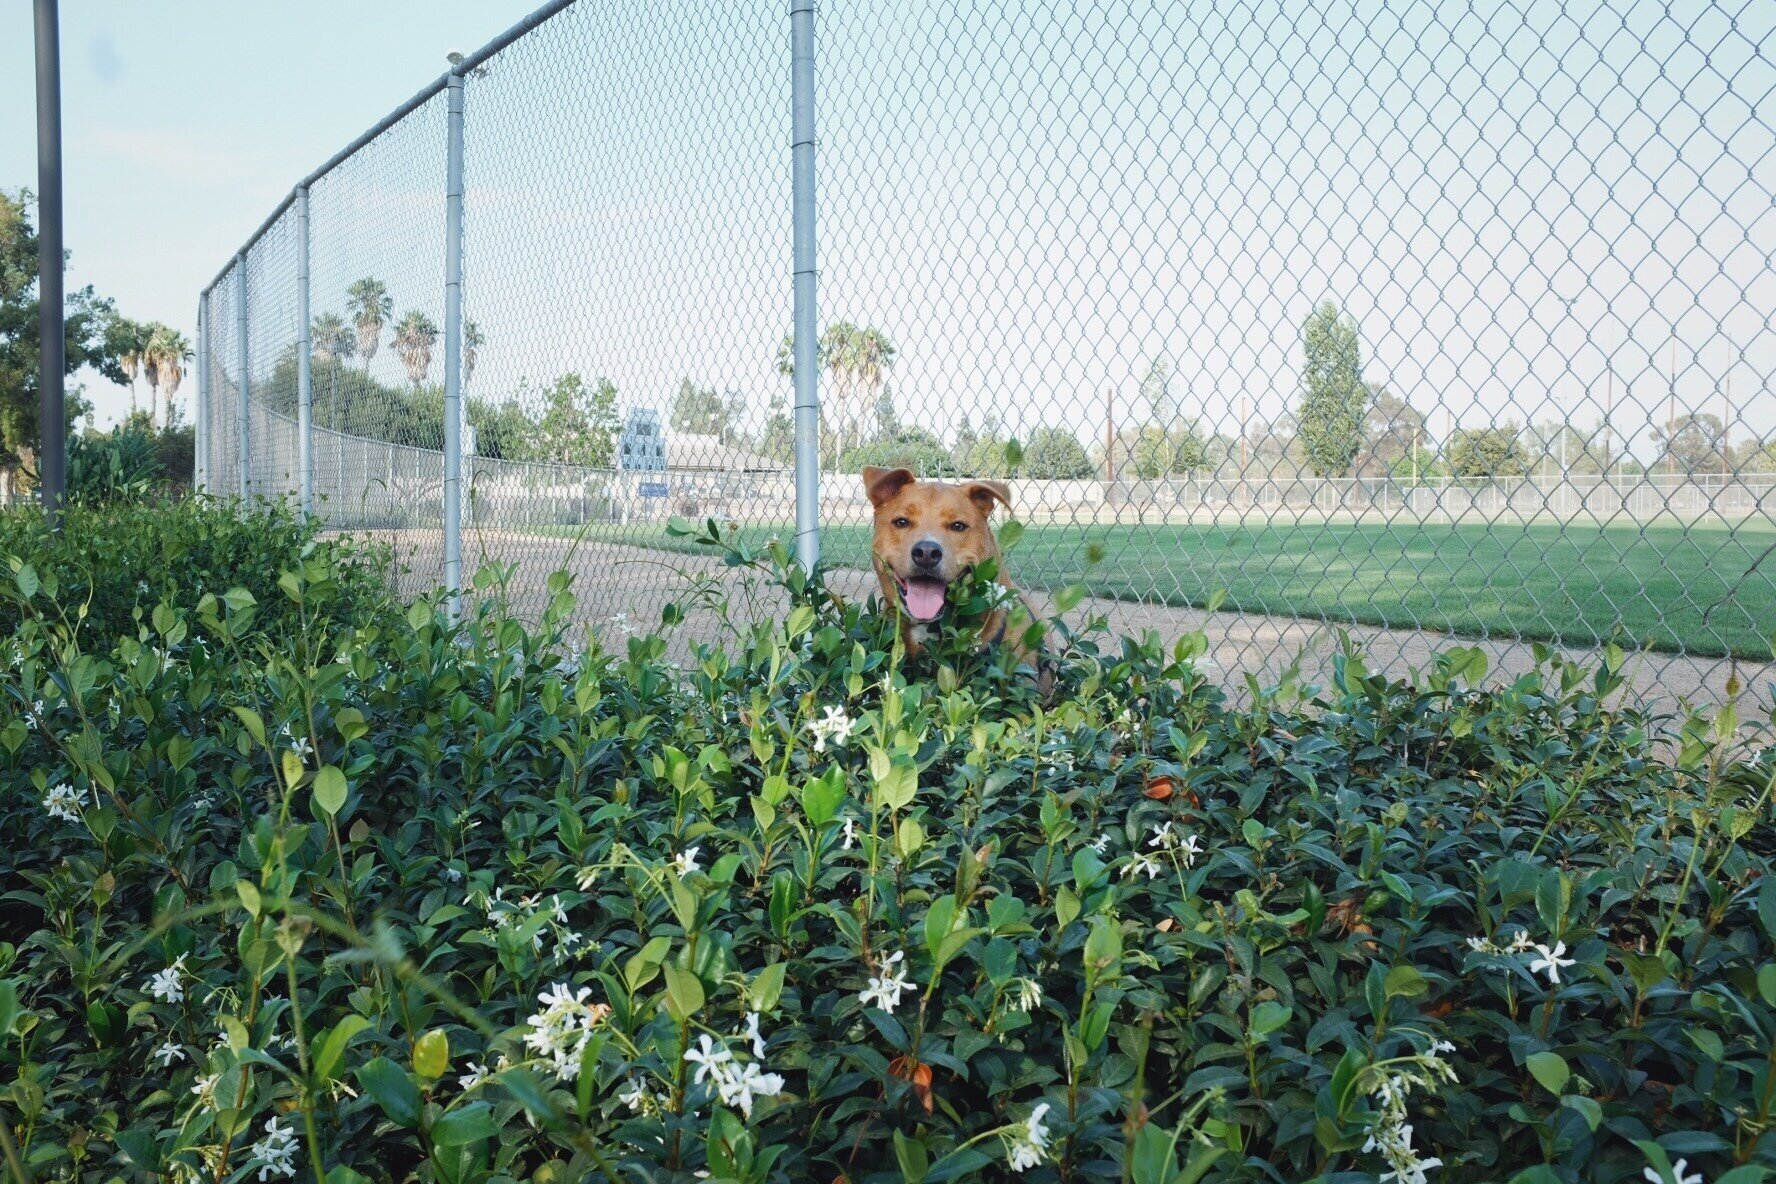 Bobby's Dog